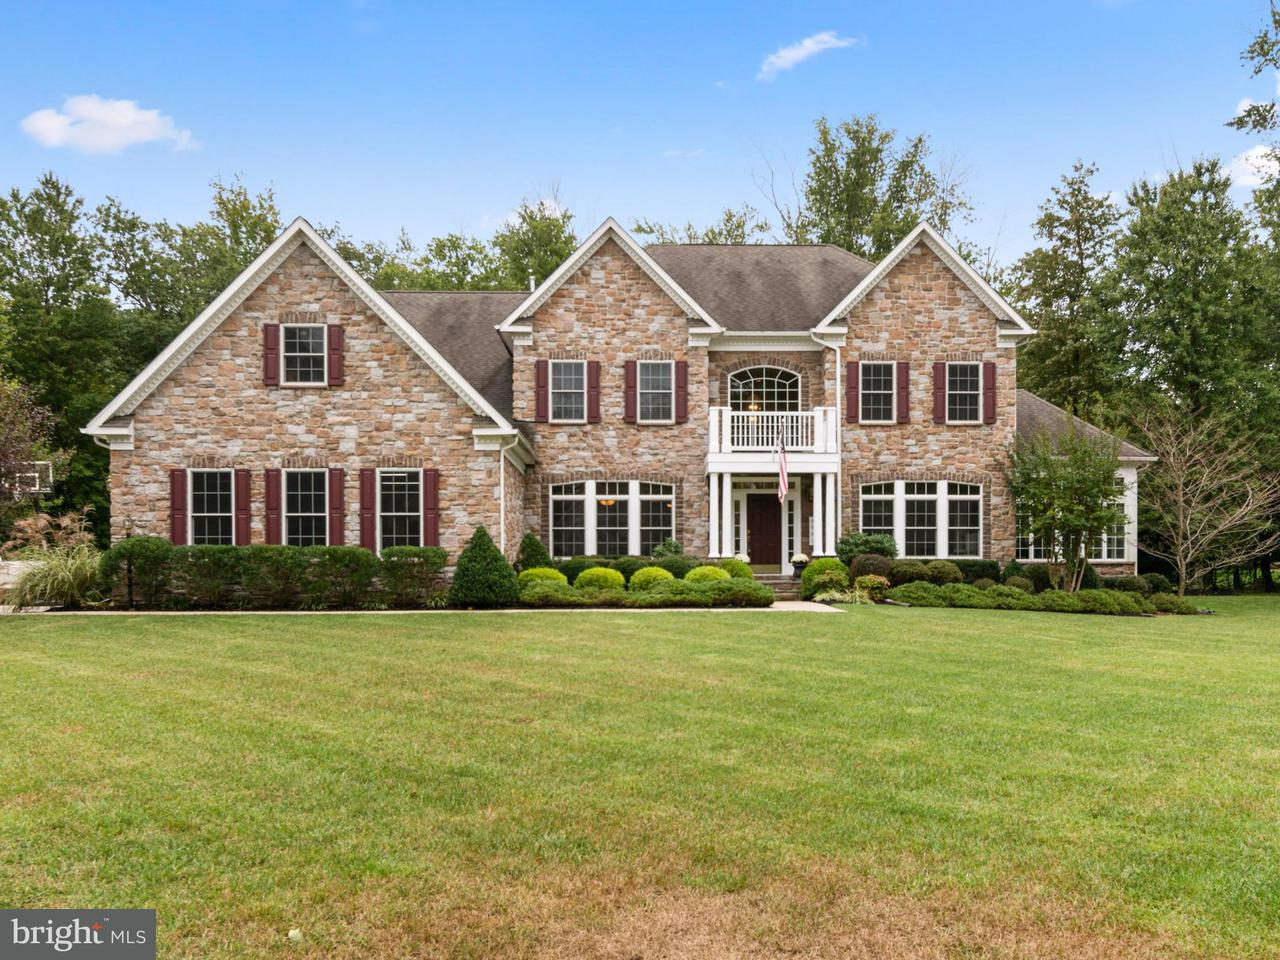 Single Family Home for Sale at 9001 BALLYBUNION Court 9001 BALLYBUNION Court Pasadena, Maryland 21122 United States